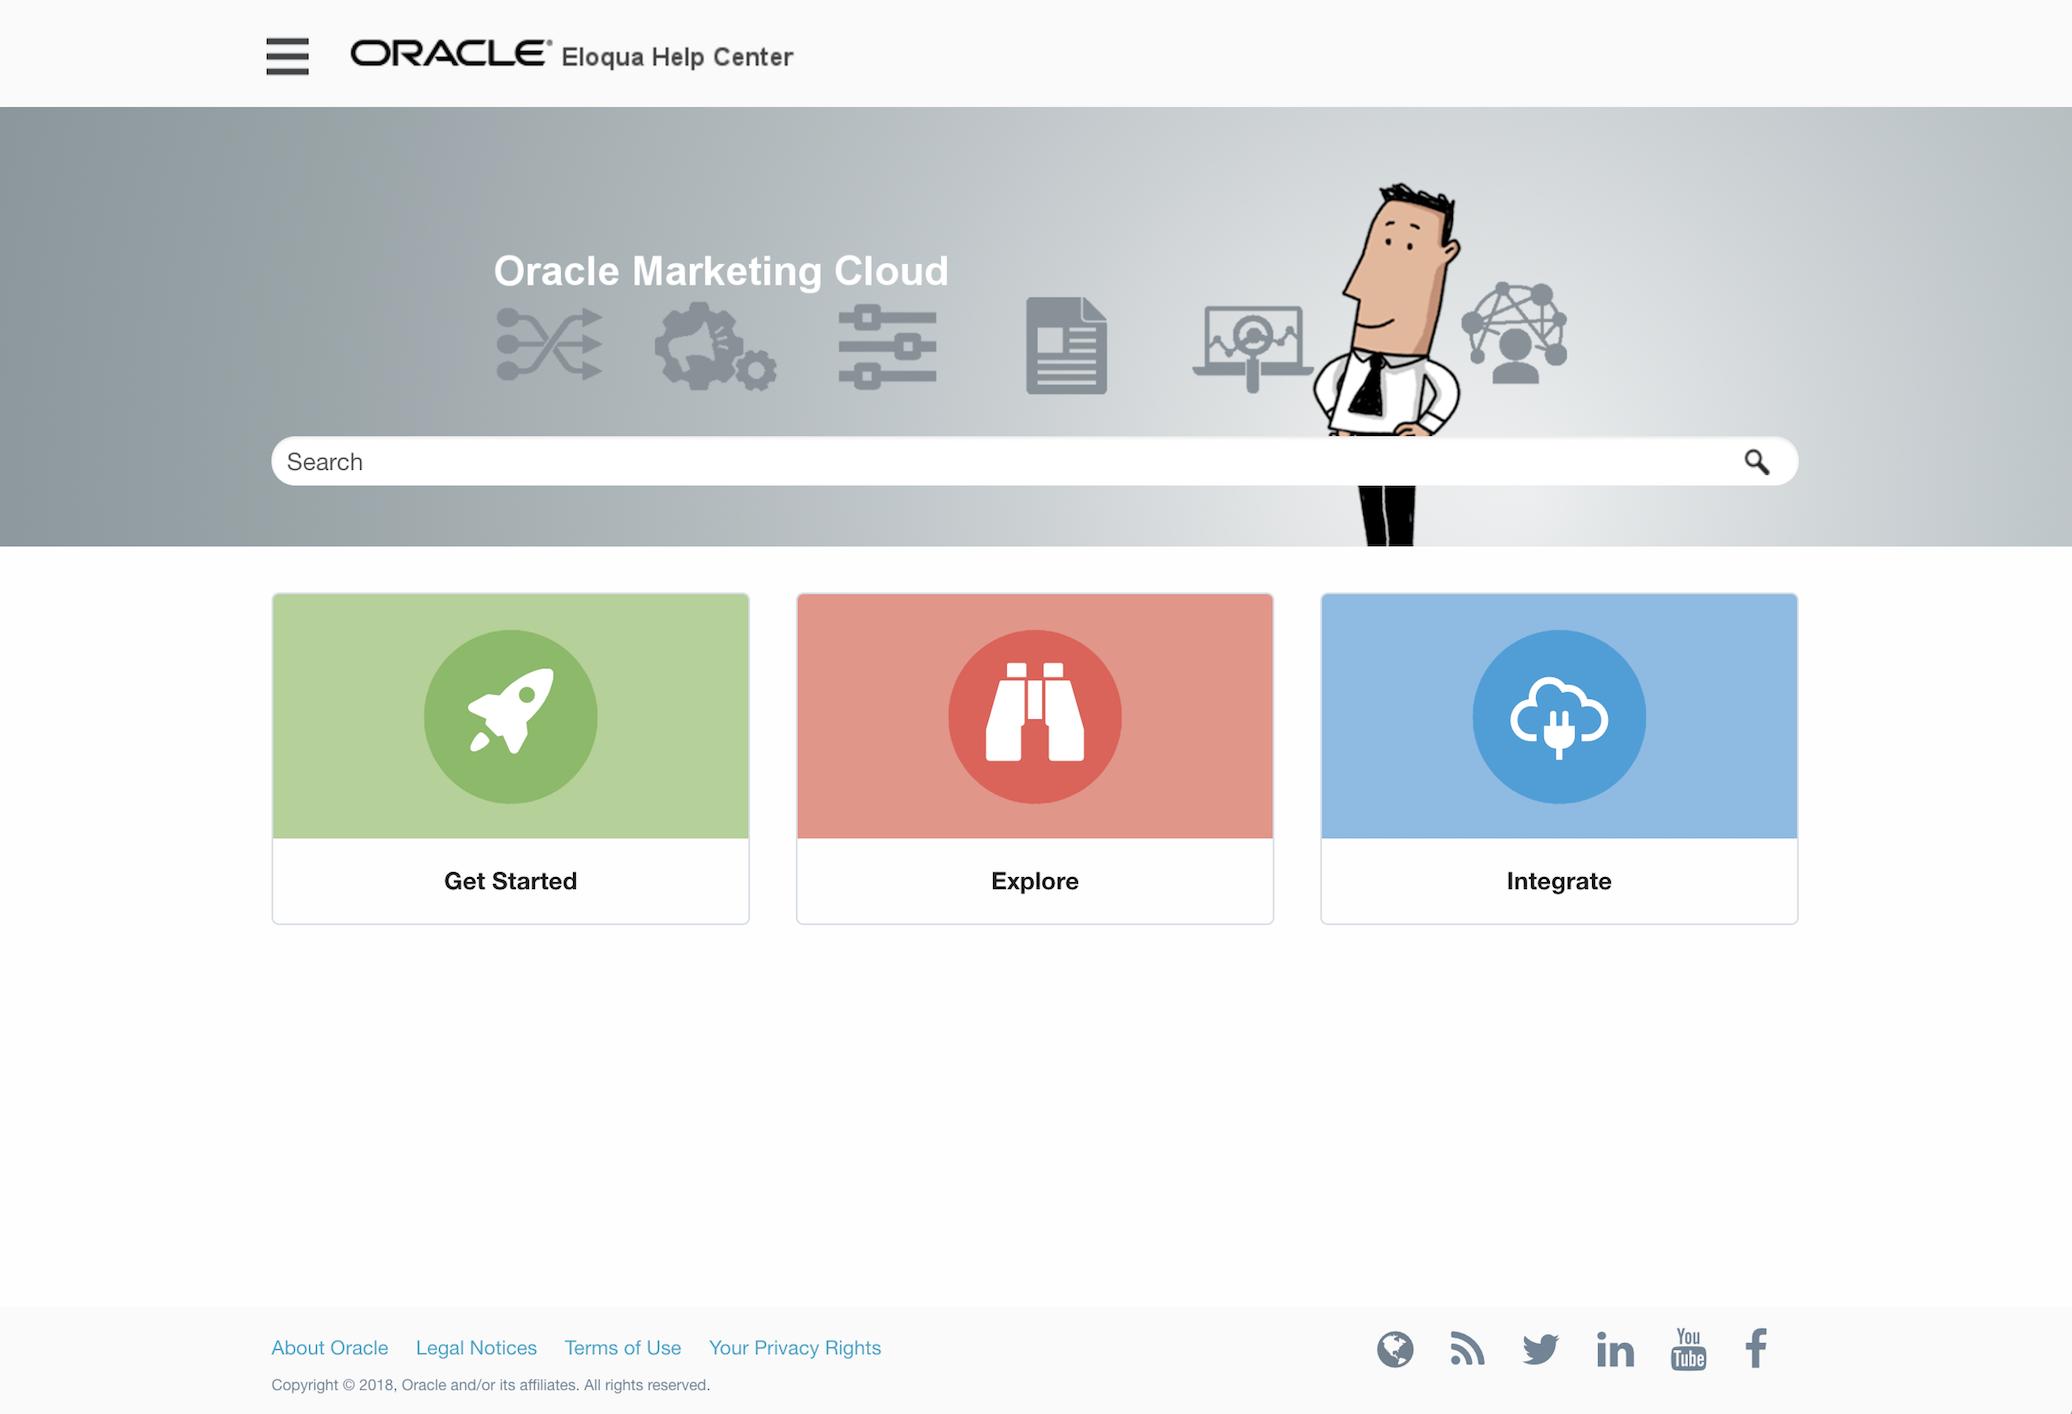 Oracle Eloqua Help Centre Home Page 2072pxl